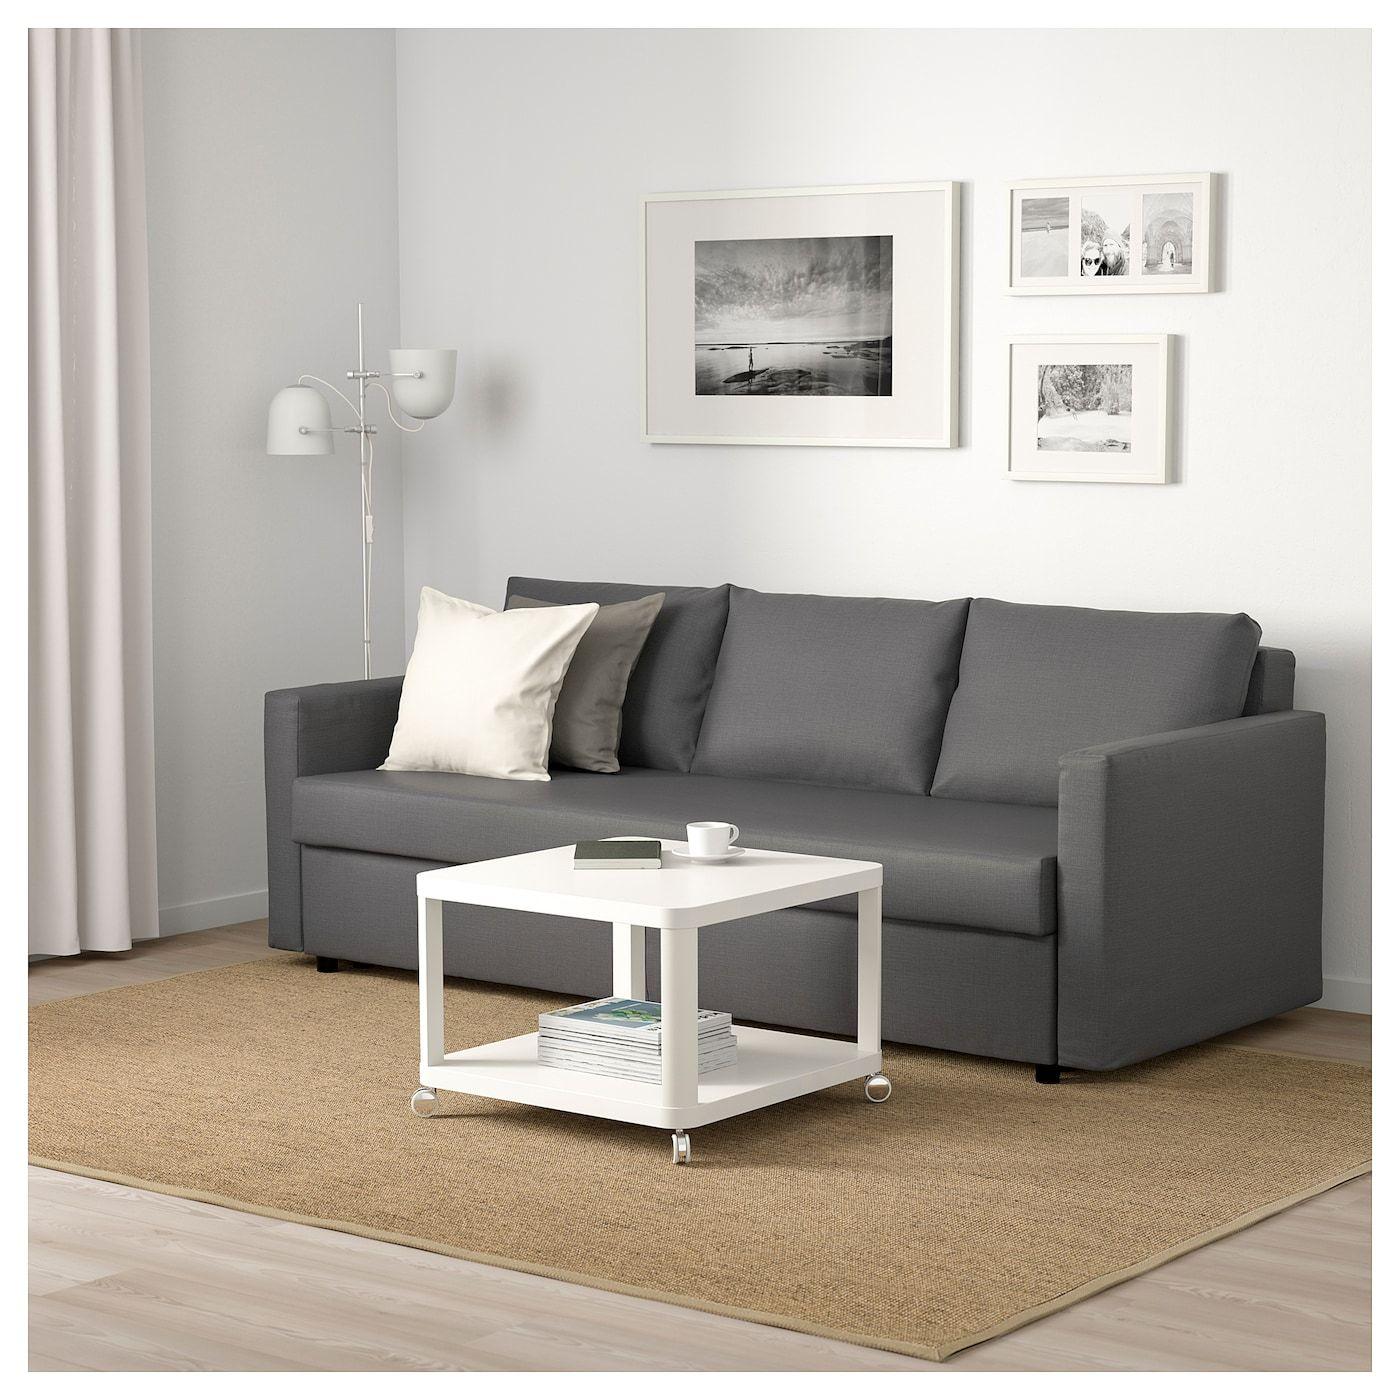 Friheten Divano Letto A 3 Posti Skiftebo Grigio Scuro Ikea It Corner Sofa Bed Friheten Sofa Ikea Bed